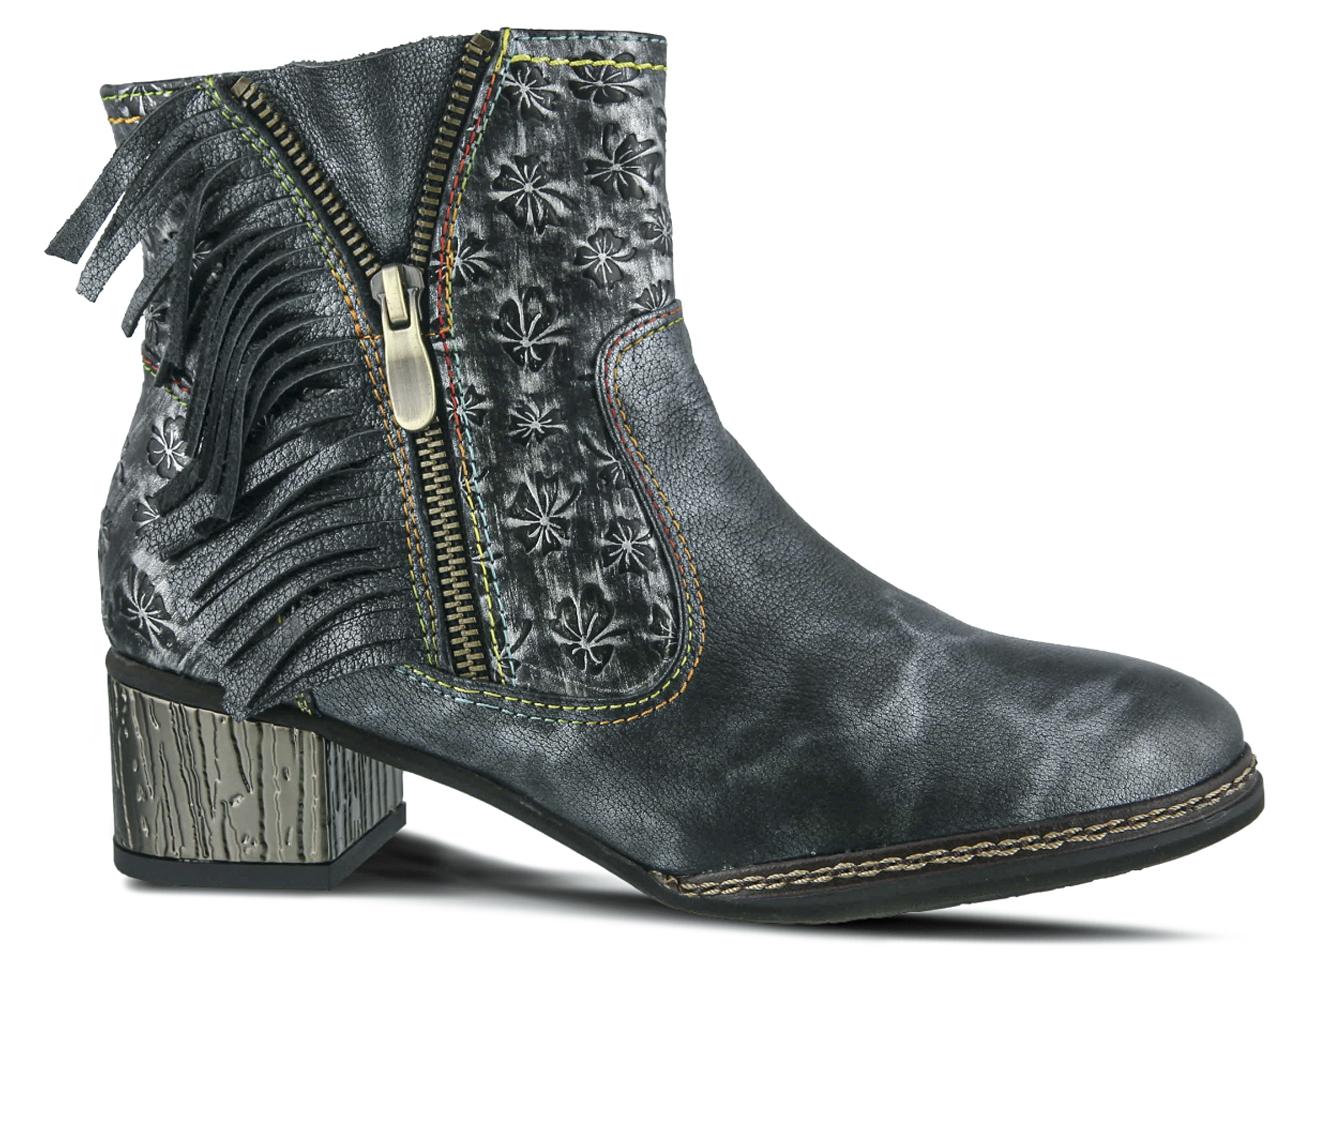 L'Artiste Kami Women's Boots (Blue Leather)